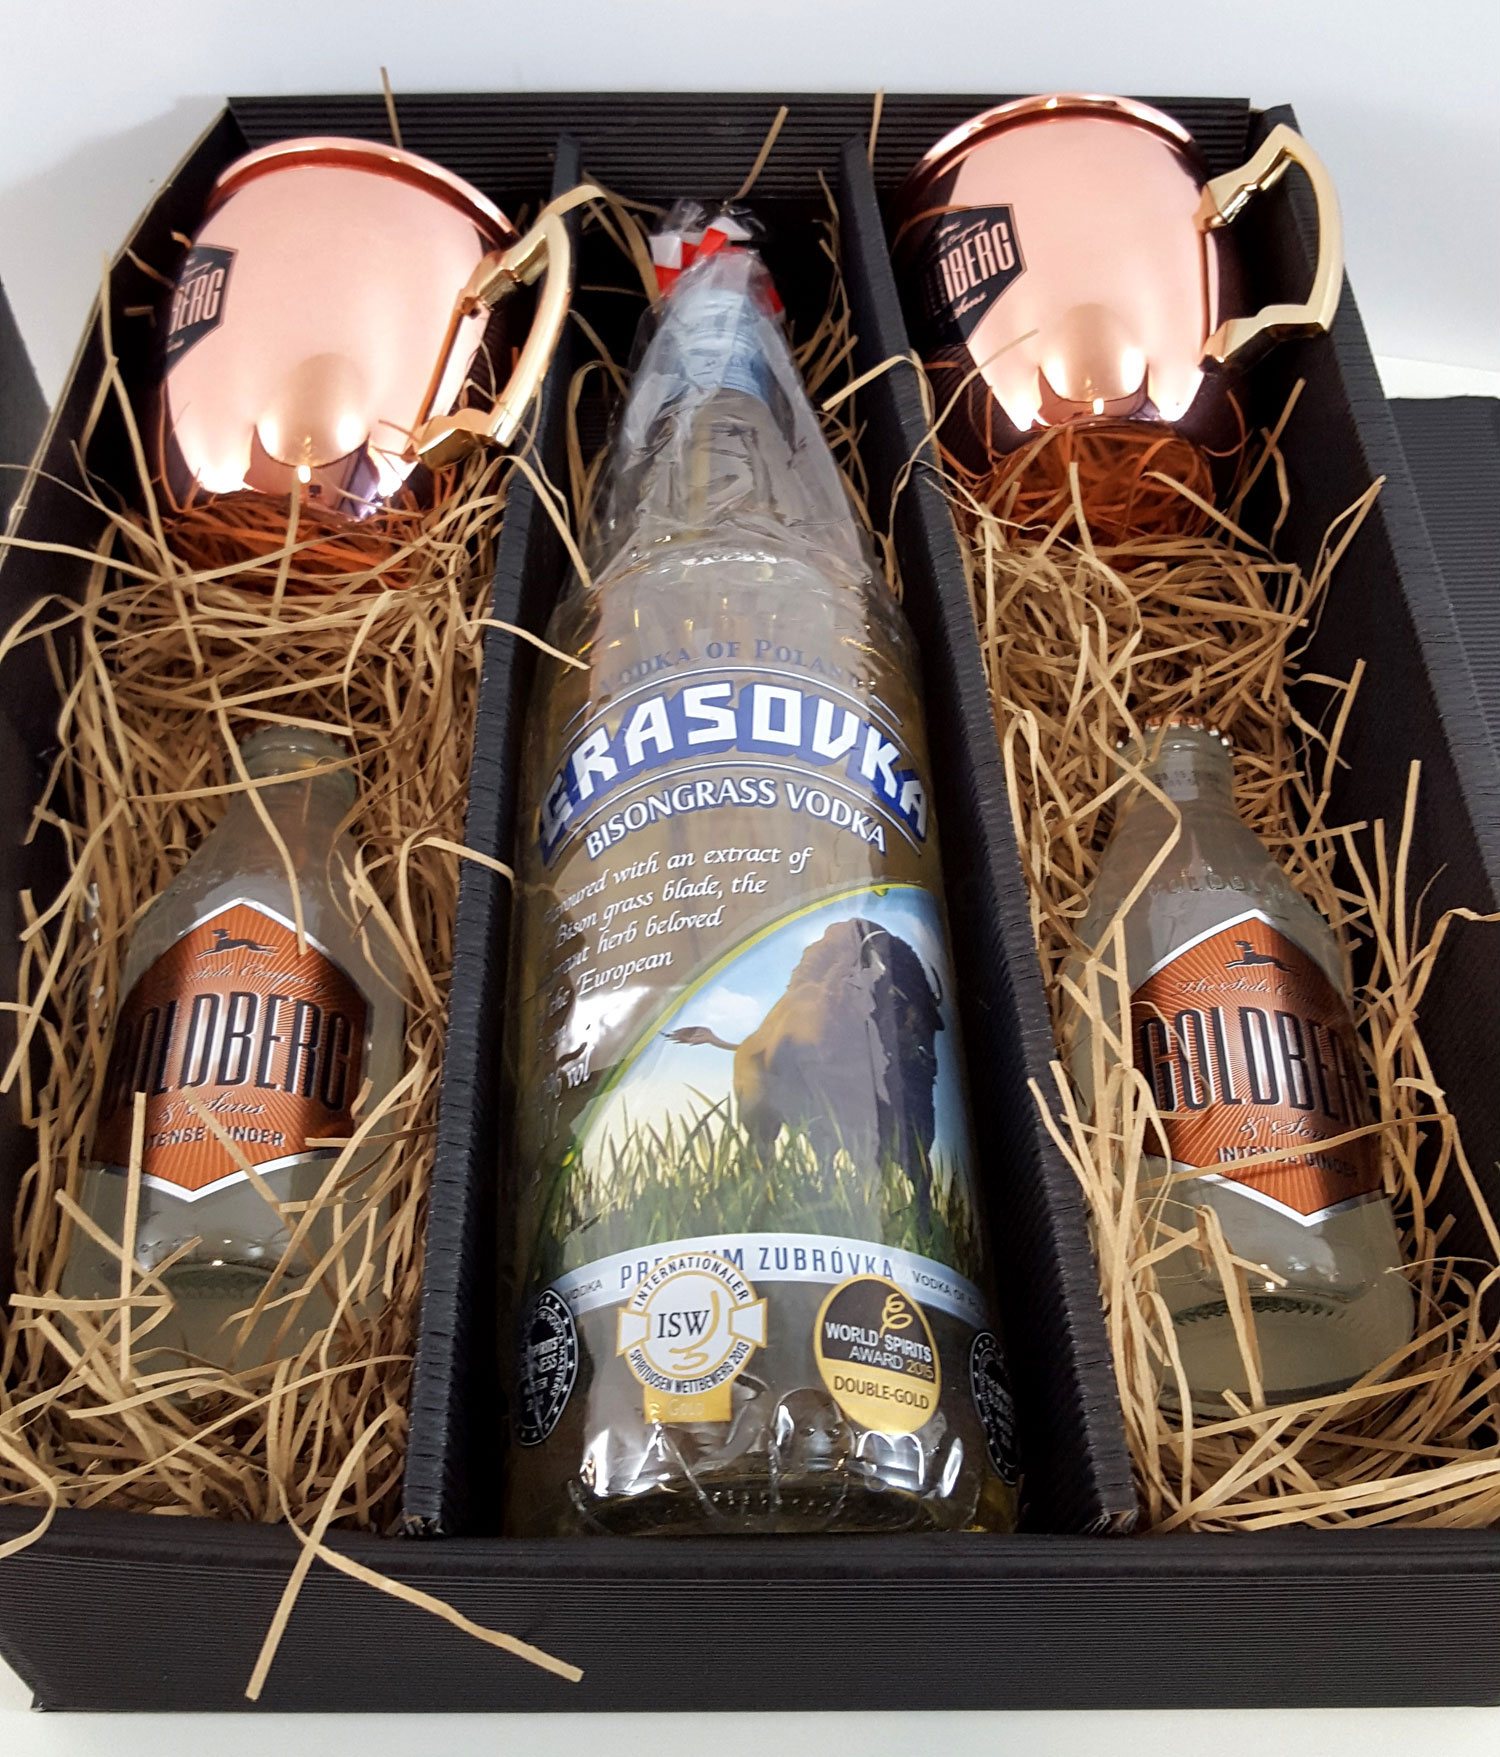 Moscow Mule Set / Geschenkset - Grasovka Büffelgras Vodka 1L (38% Vol) + 2x Goldberg Kupferbecher + 2x Goldberg Intense Ginger 200ml - Inkl. Pfand MEHRWEG